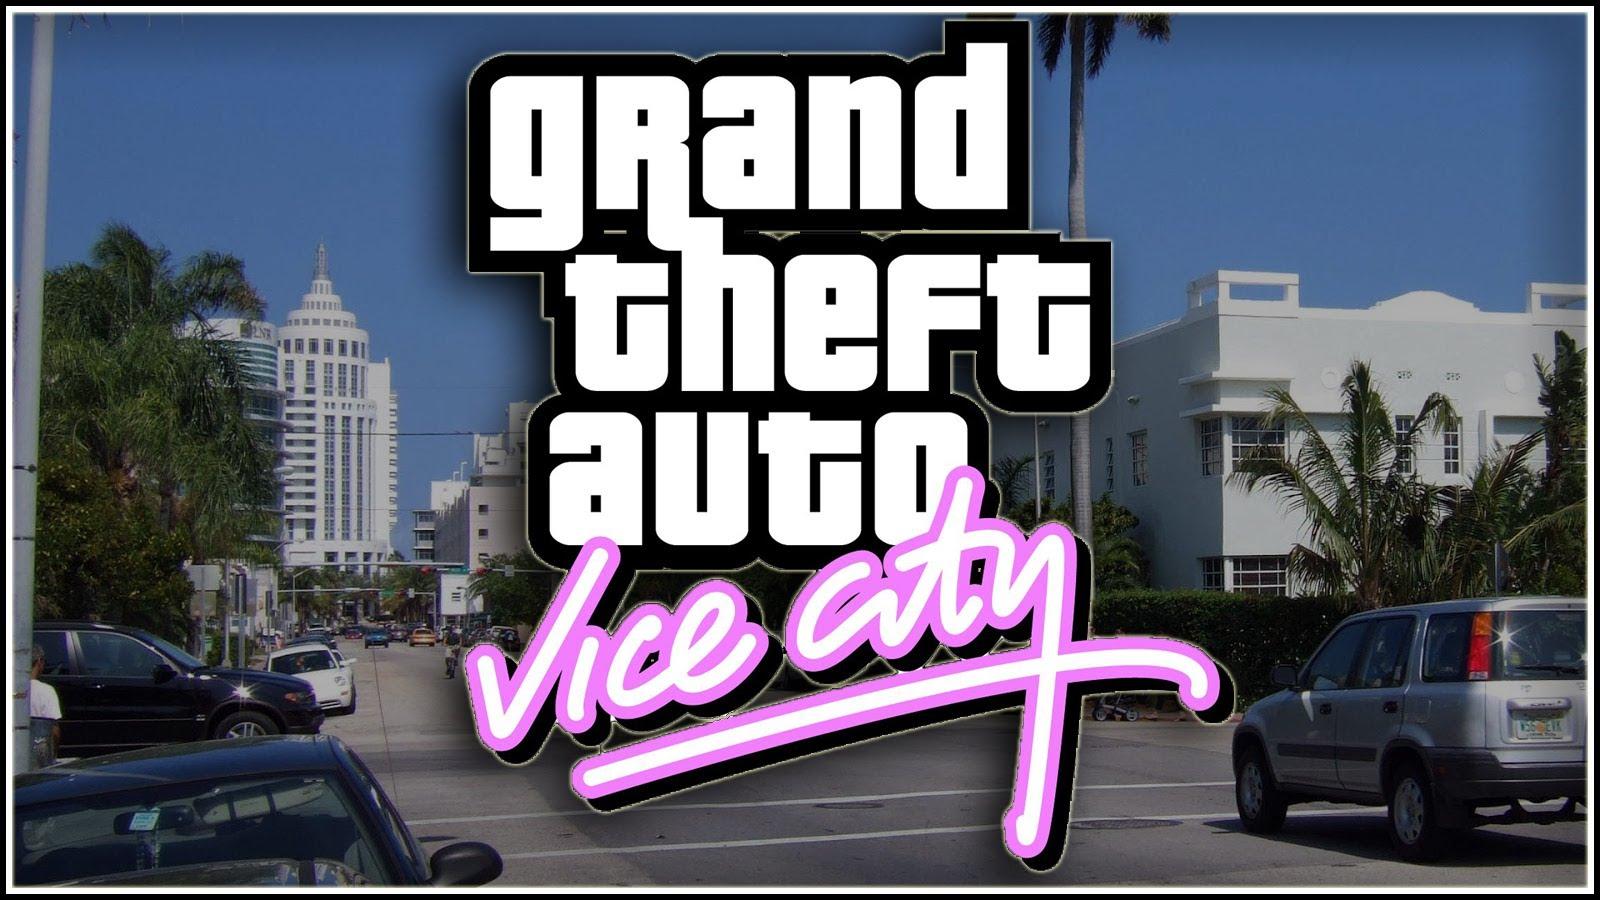 Grand Theft Auto Vice City - GameSpot